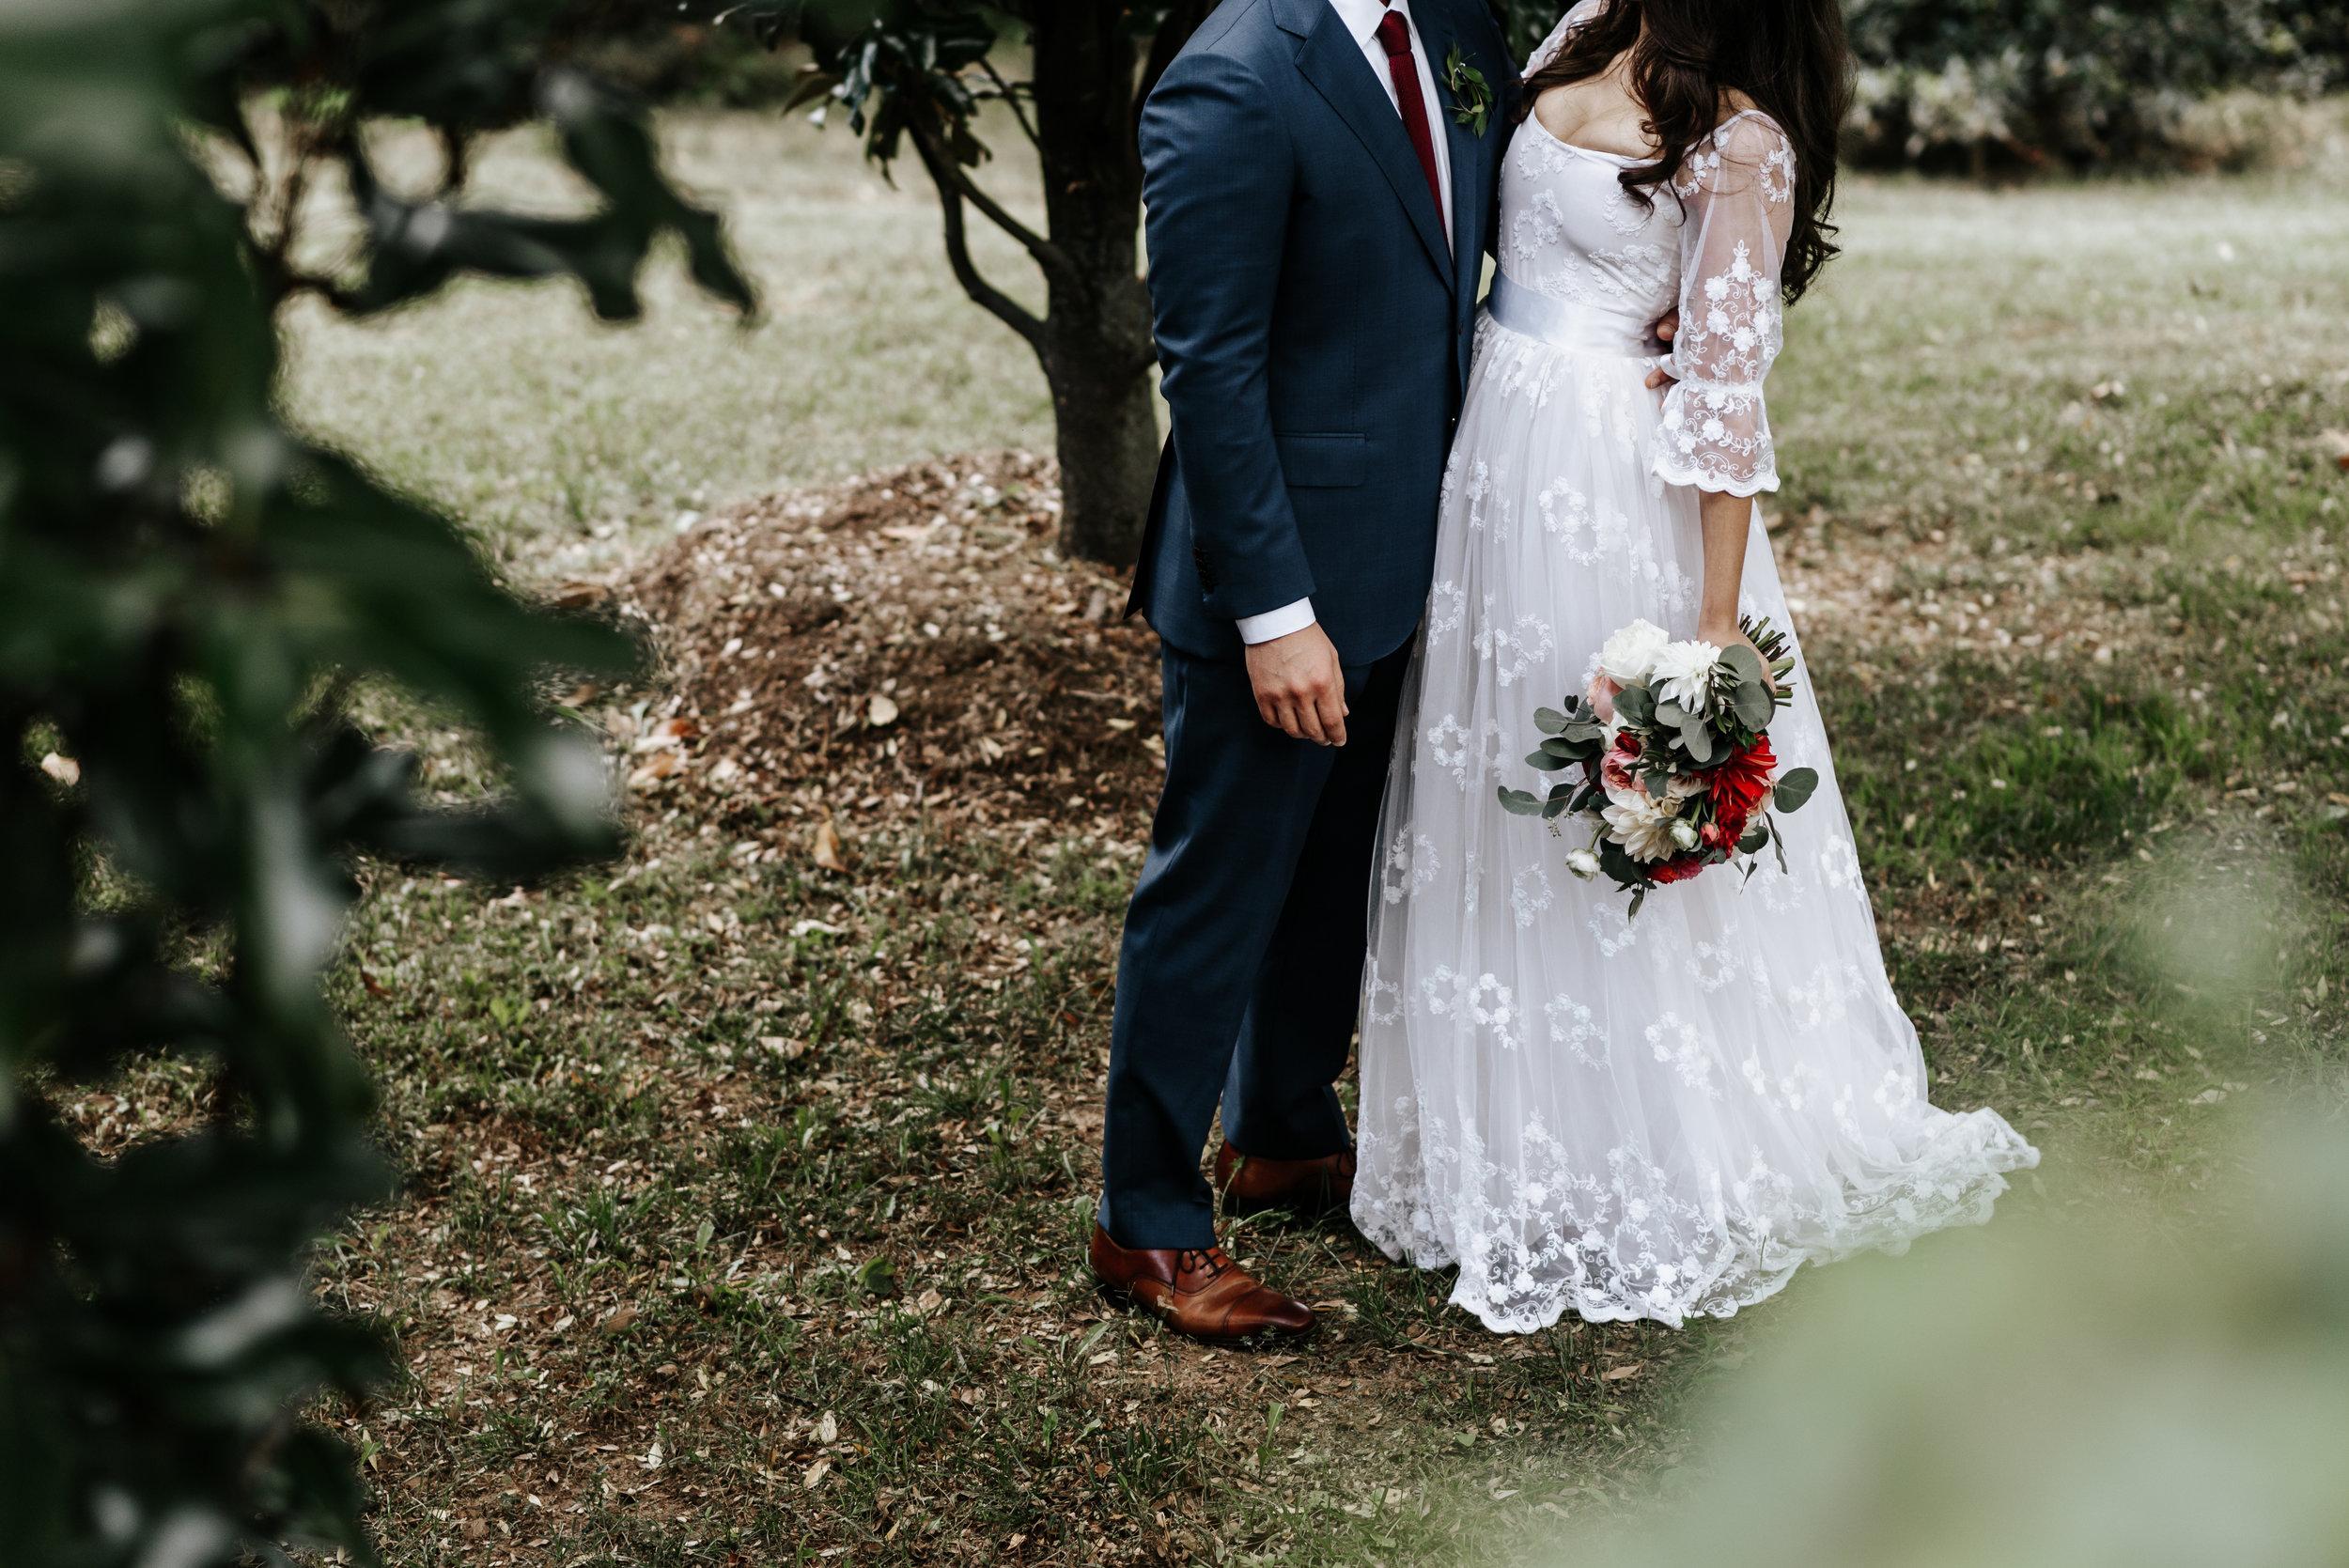 Veritas-Vineyards-and-Winery-Wedding-Photography-Afton-Virginia-Yasmin-Seth-Photography-by-V-2203.jpg